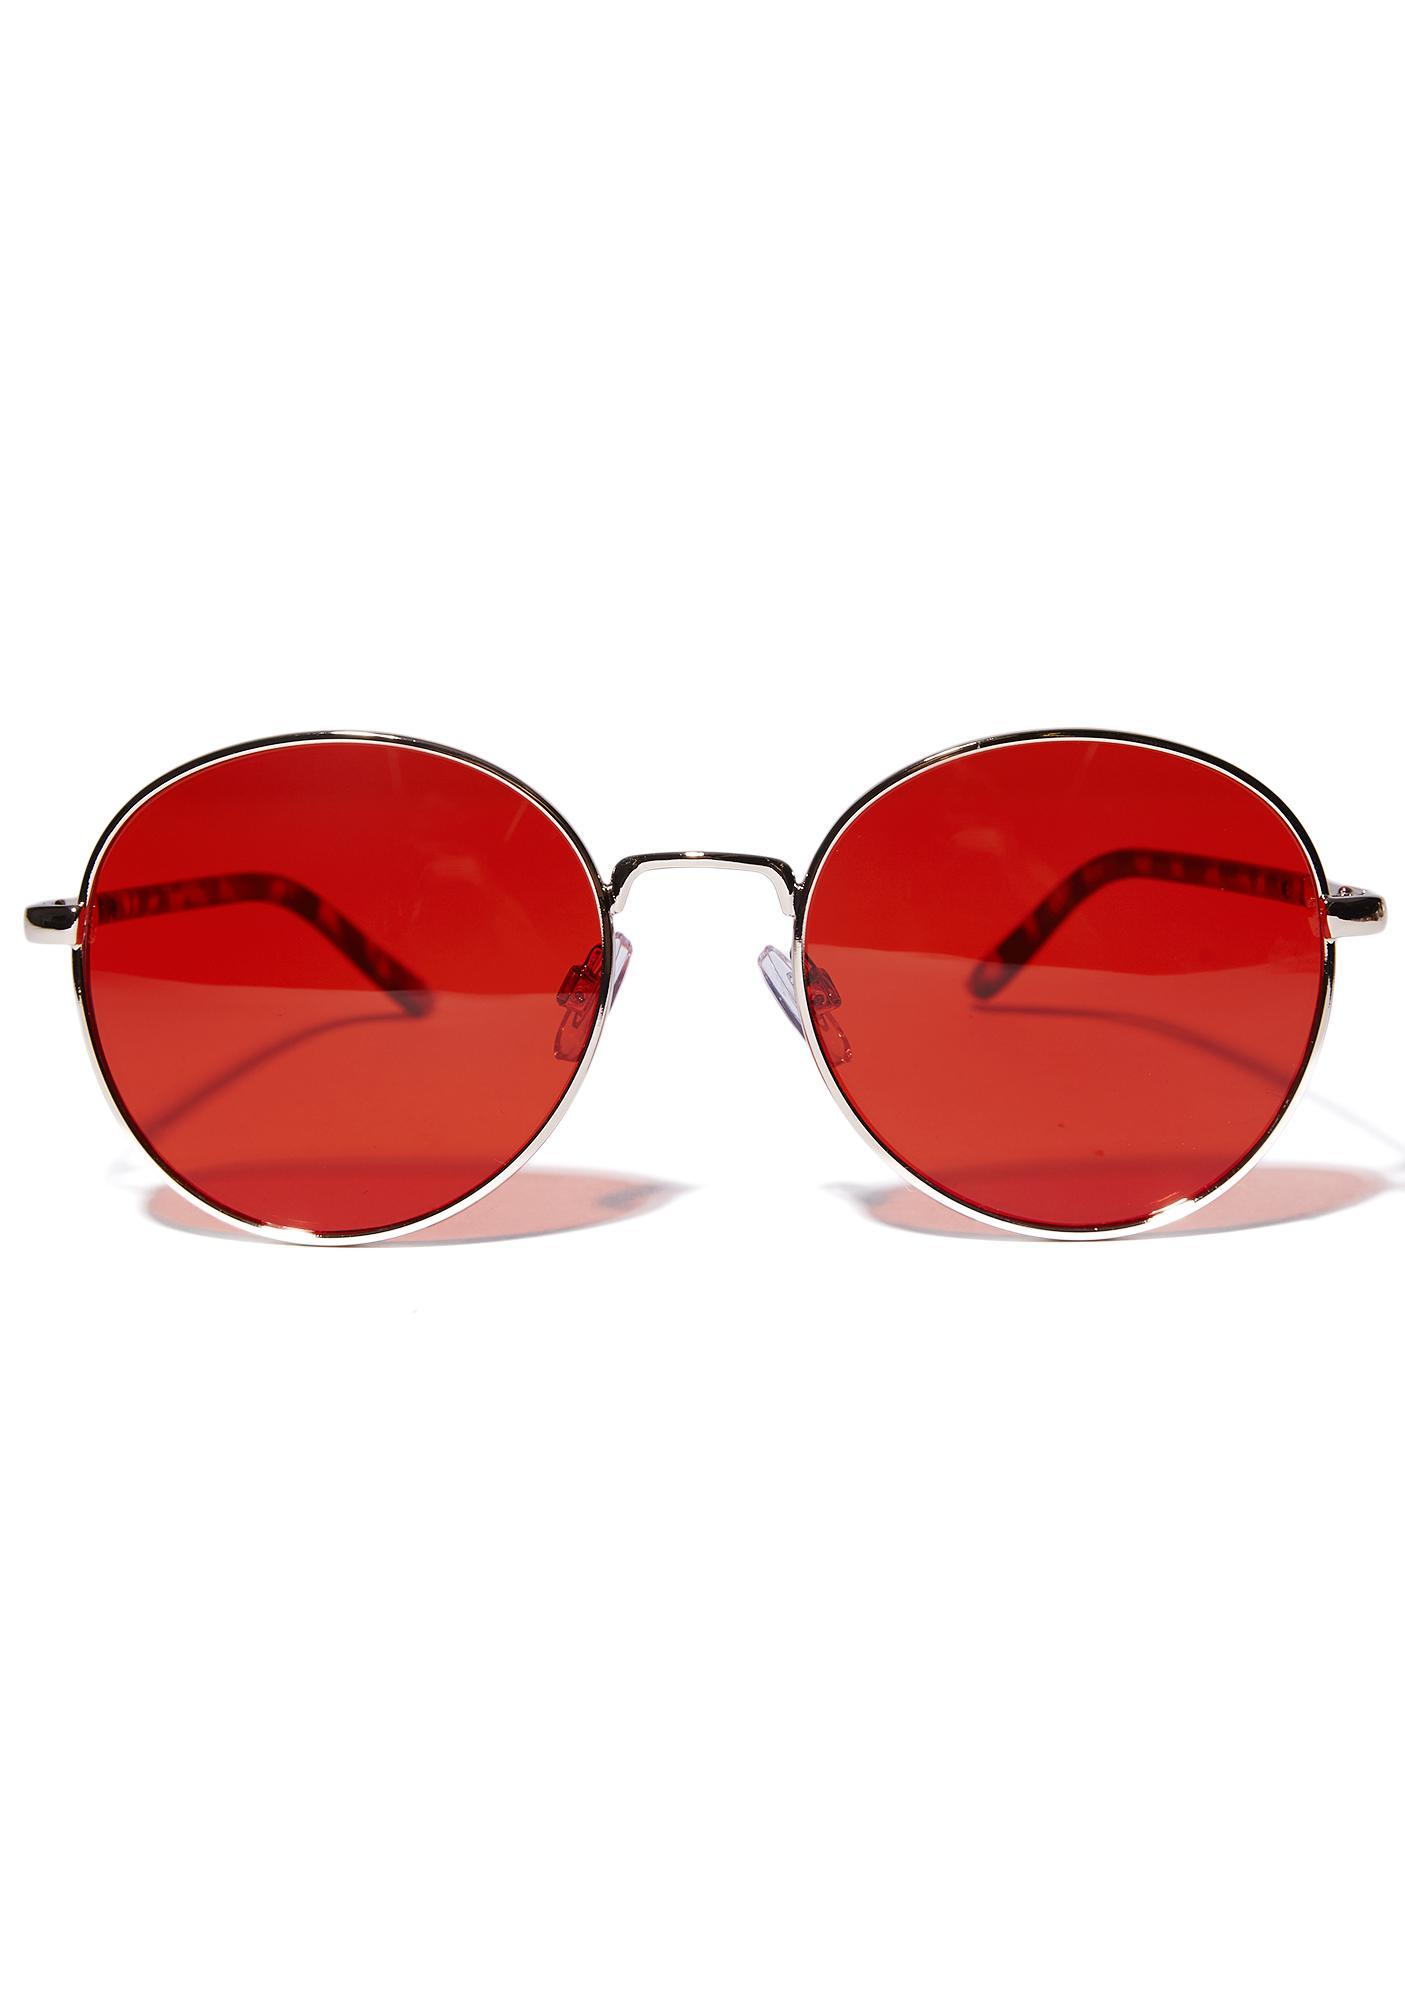 City Gal Round Sunglasses